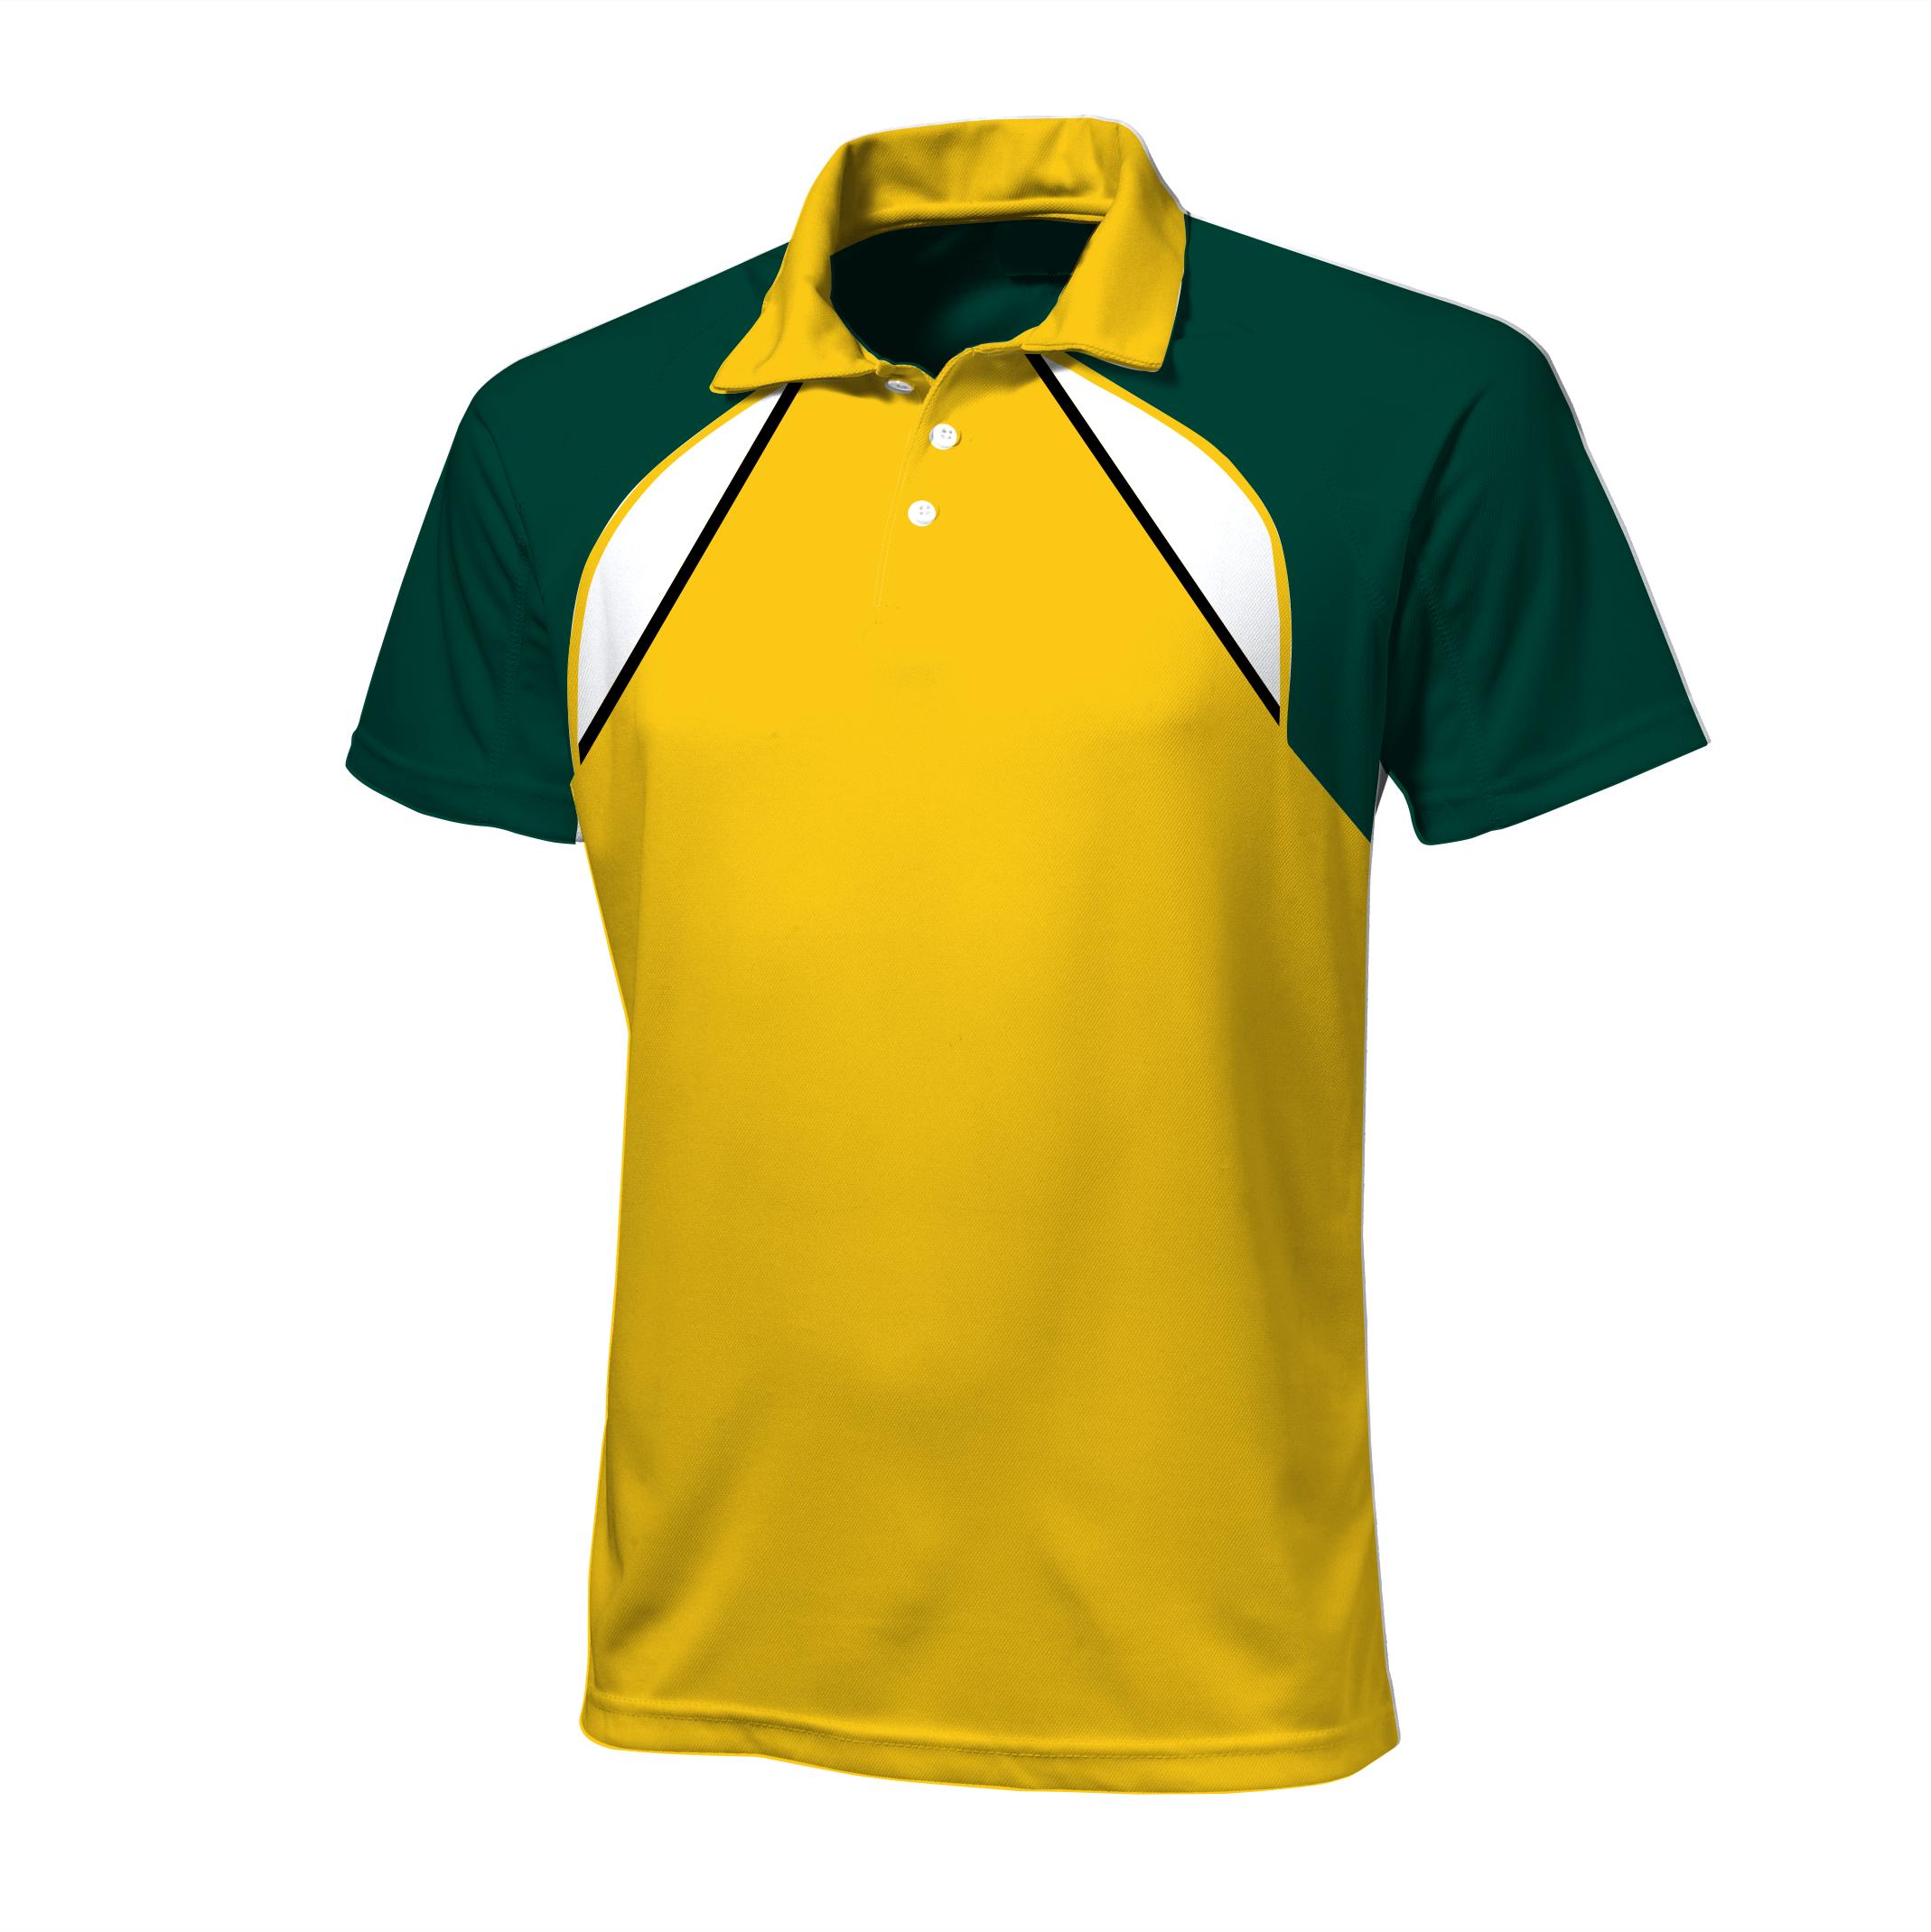 Panelled Zuco golfer - Mick